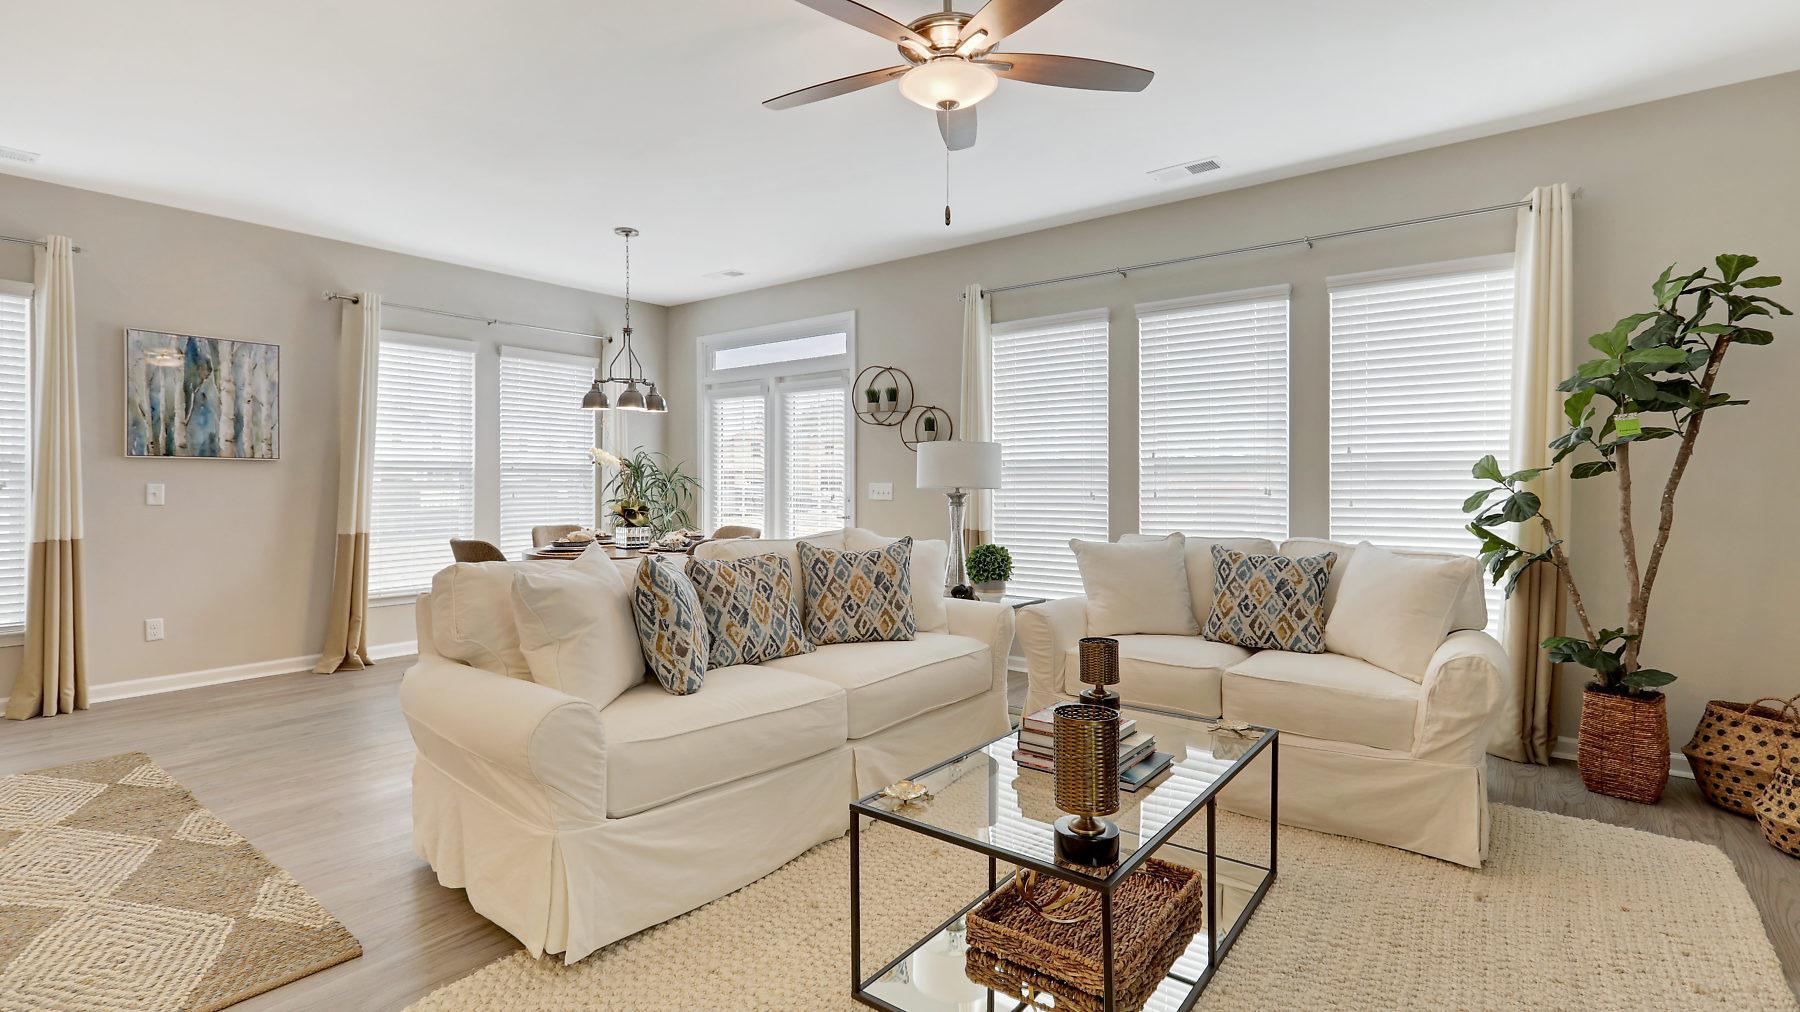 Living Area featured in the Harborside By Landmark 24 Homes  in Savannah, GA